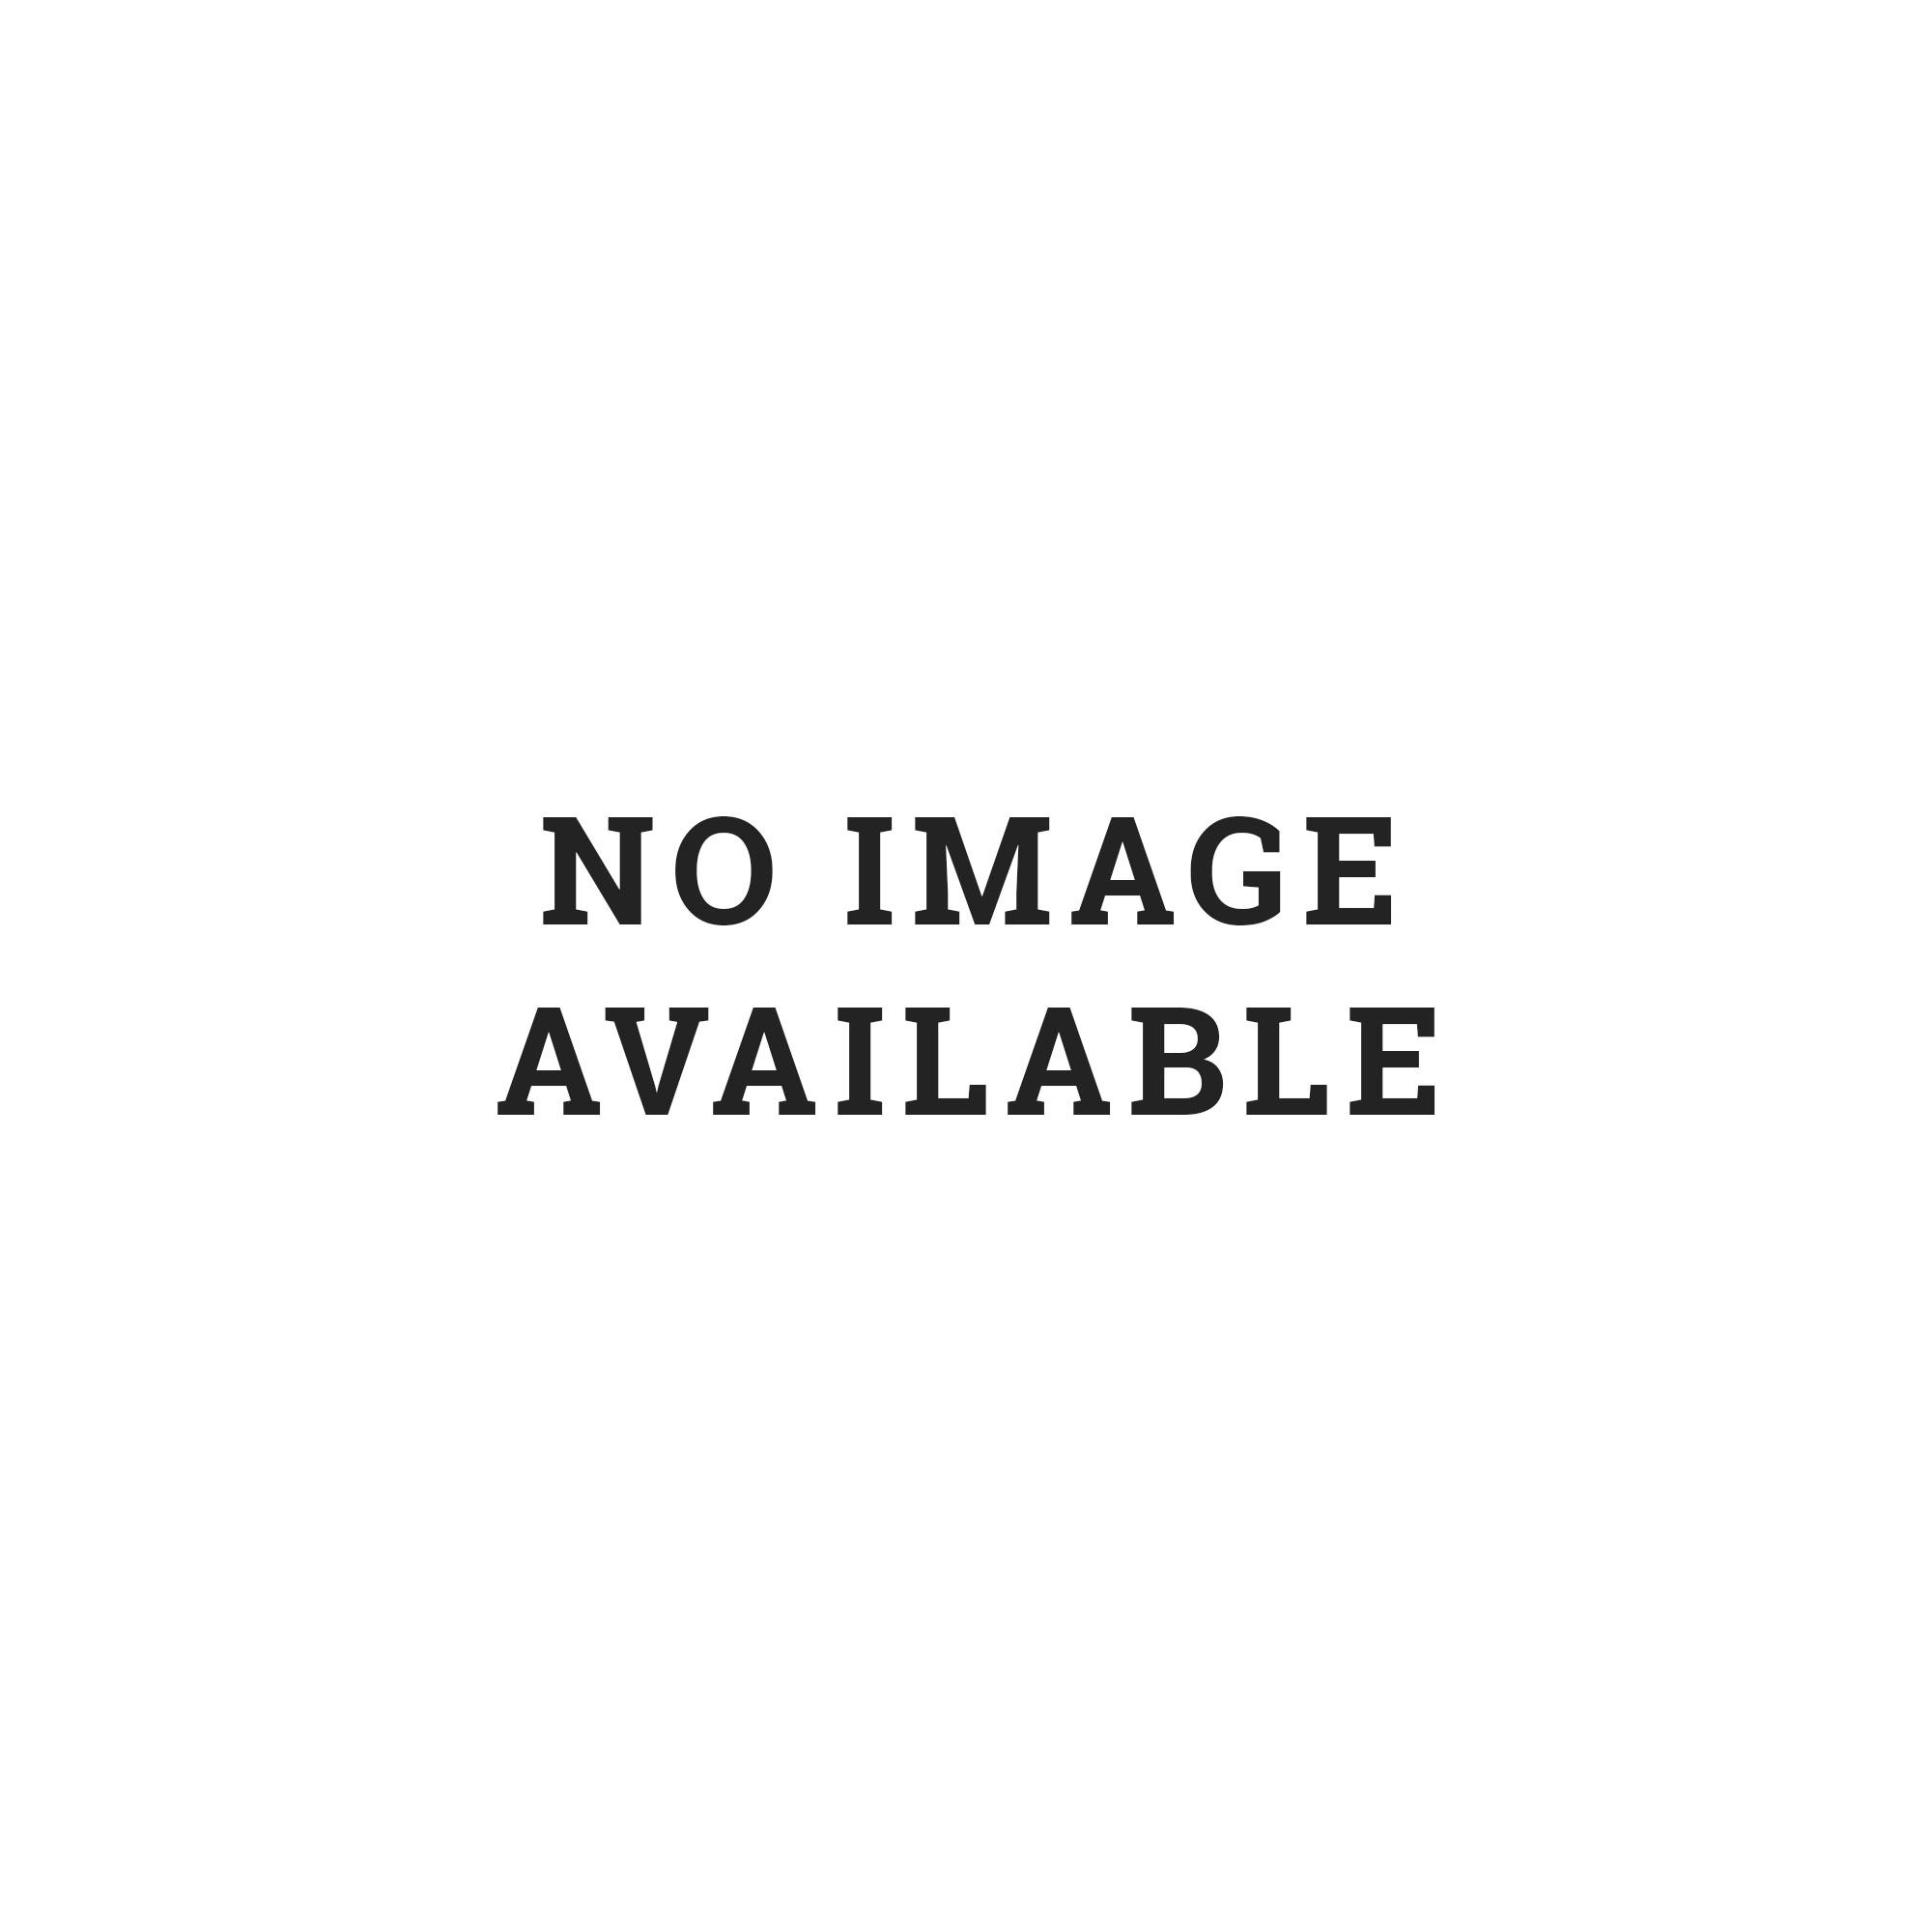 Art Company Art Stylish W113 Leather Womens Wedge High Heel Sandals - White, Blue + Pink